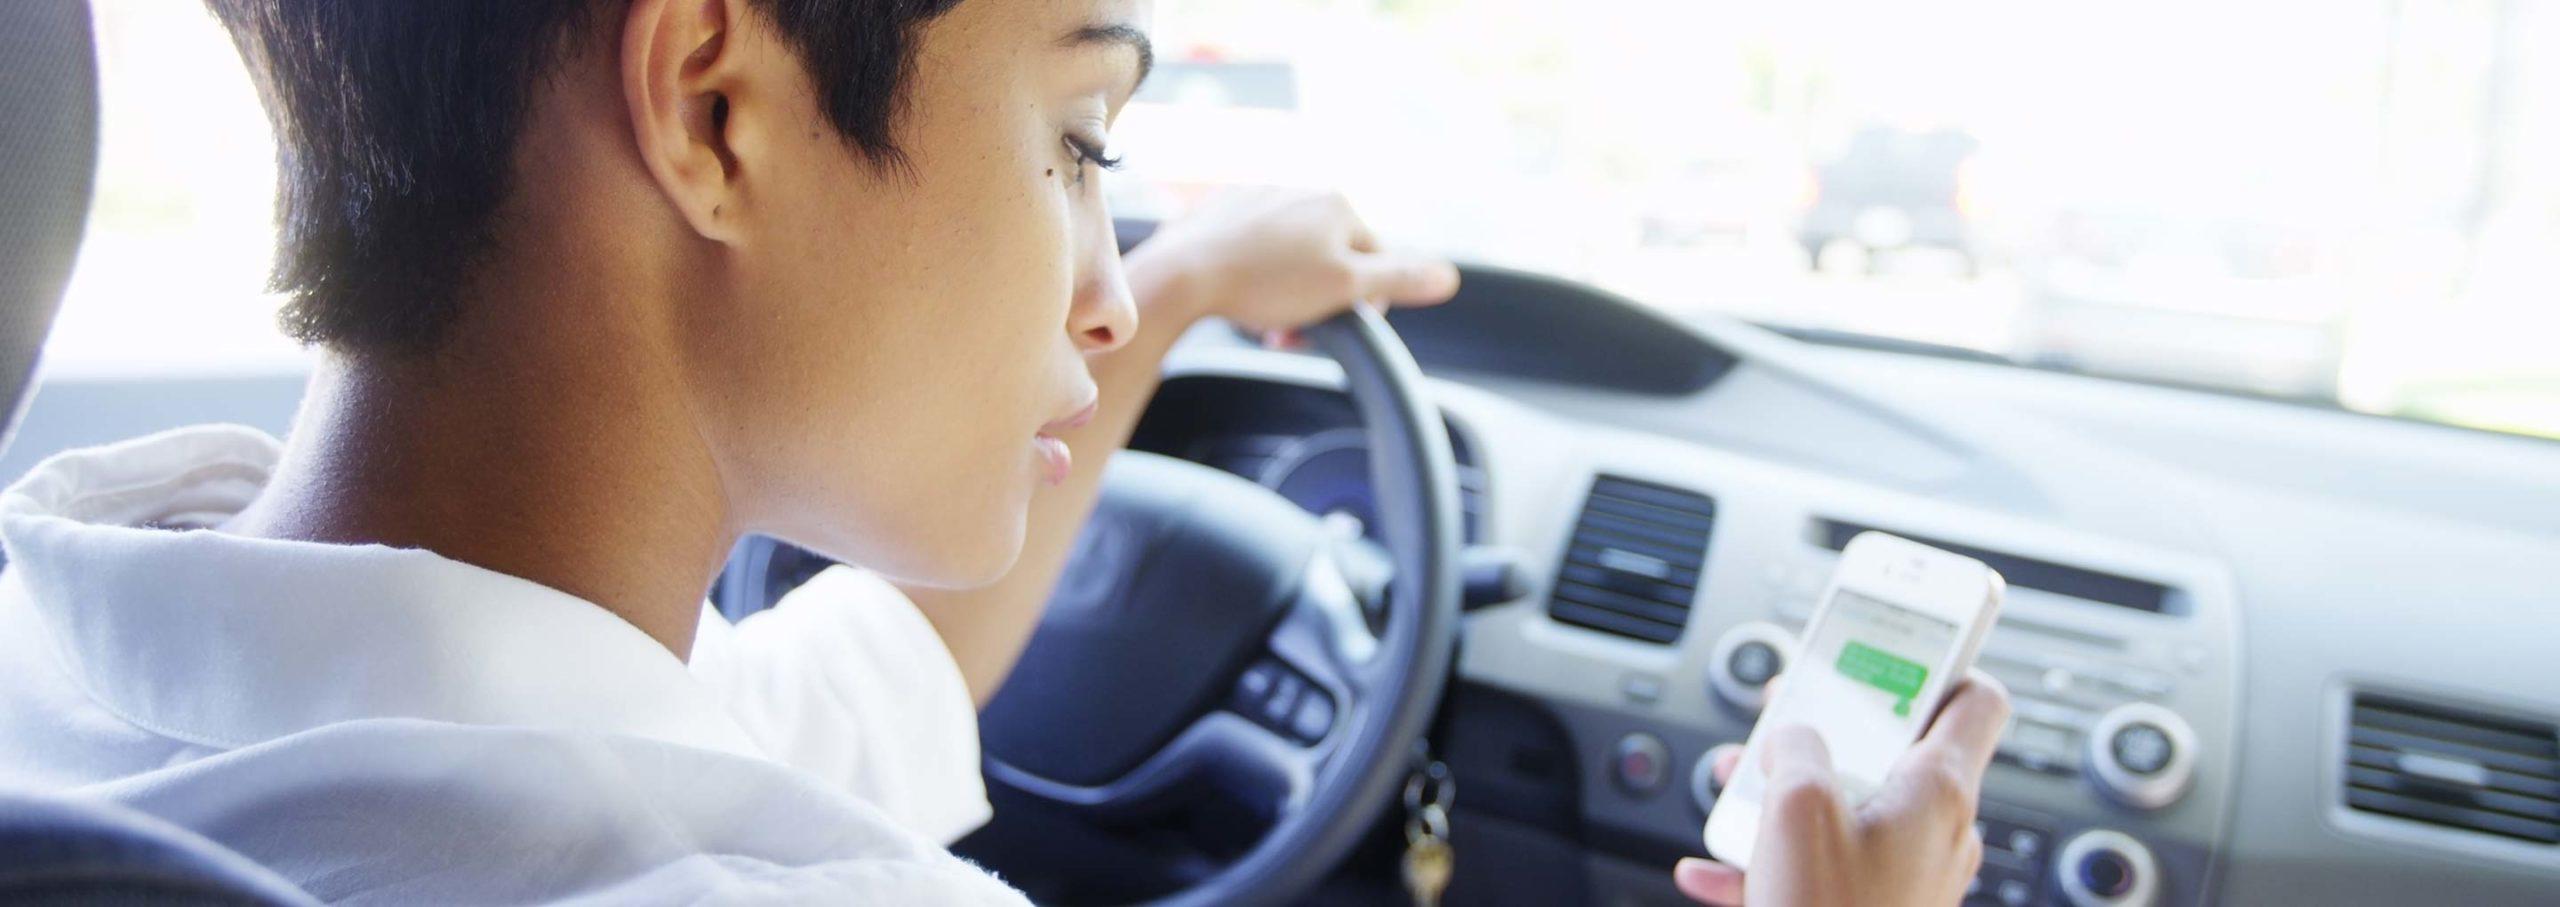 distracted driving looking at phone